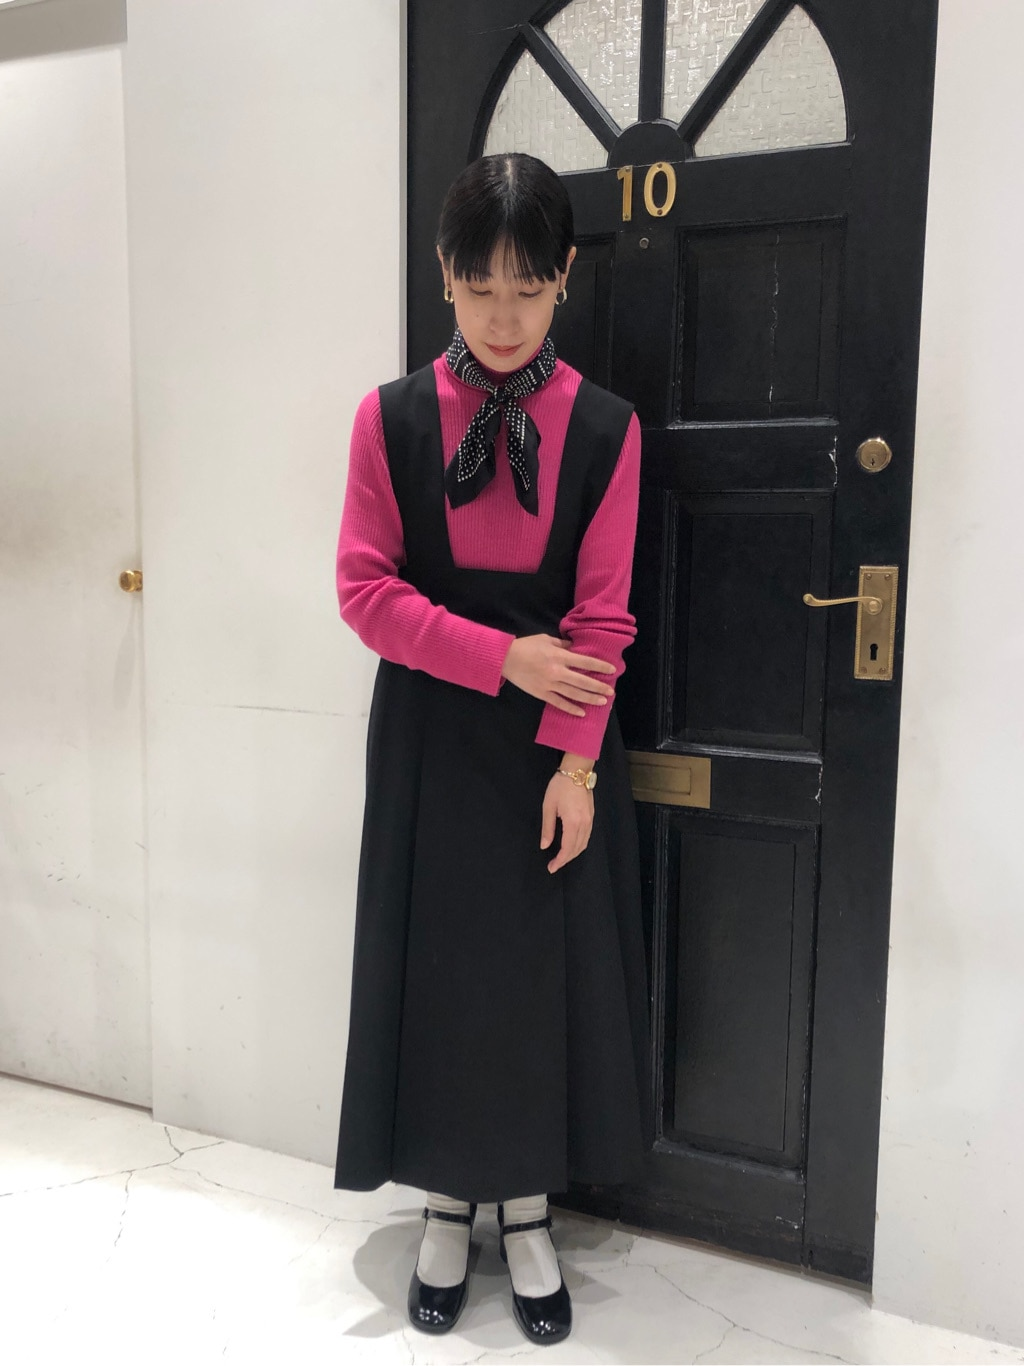 Dot and Stripes CHILD WOMAN ルクアイーレ 身長:151cm 2020.11.11